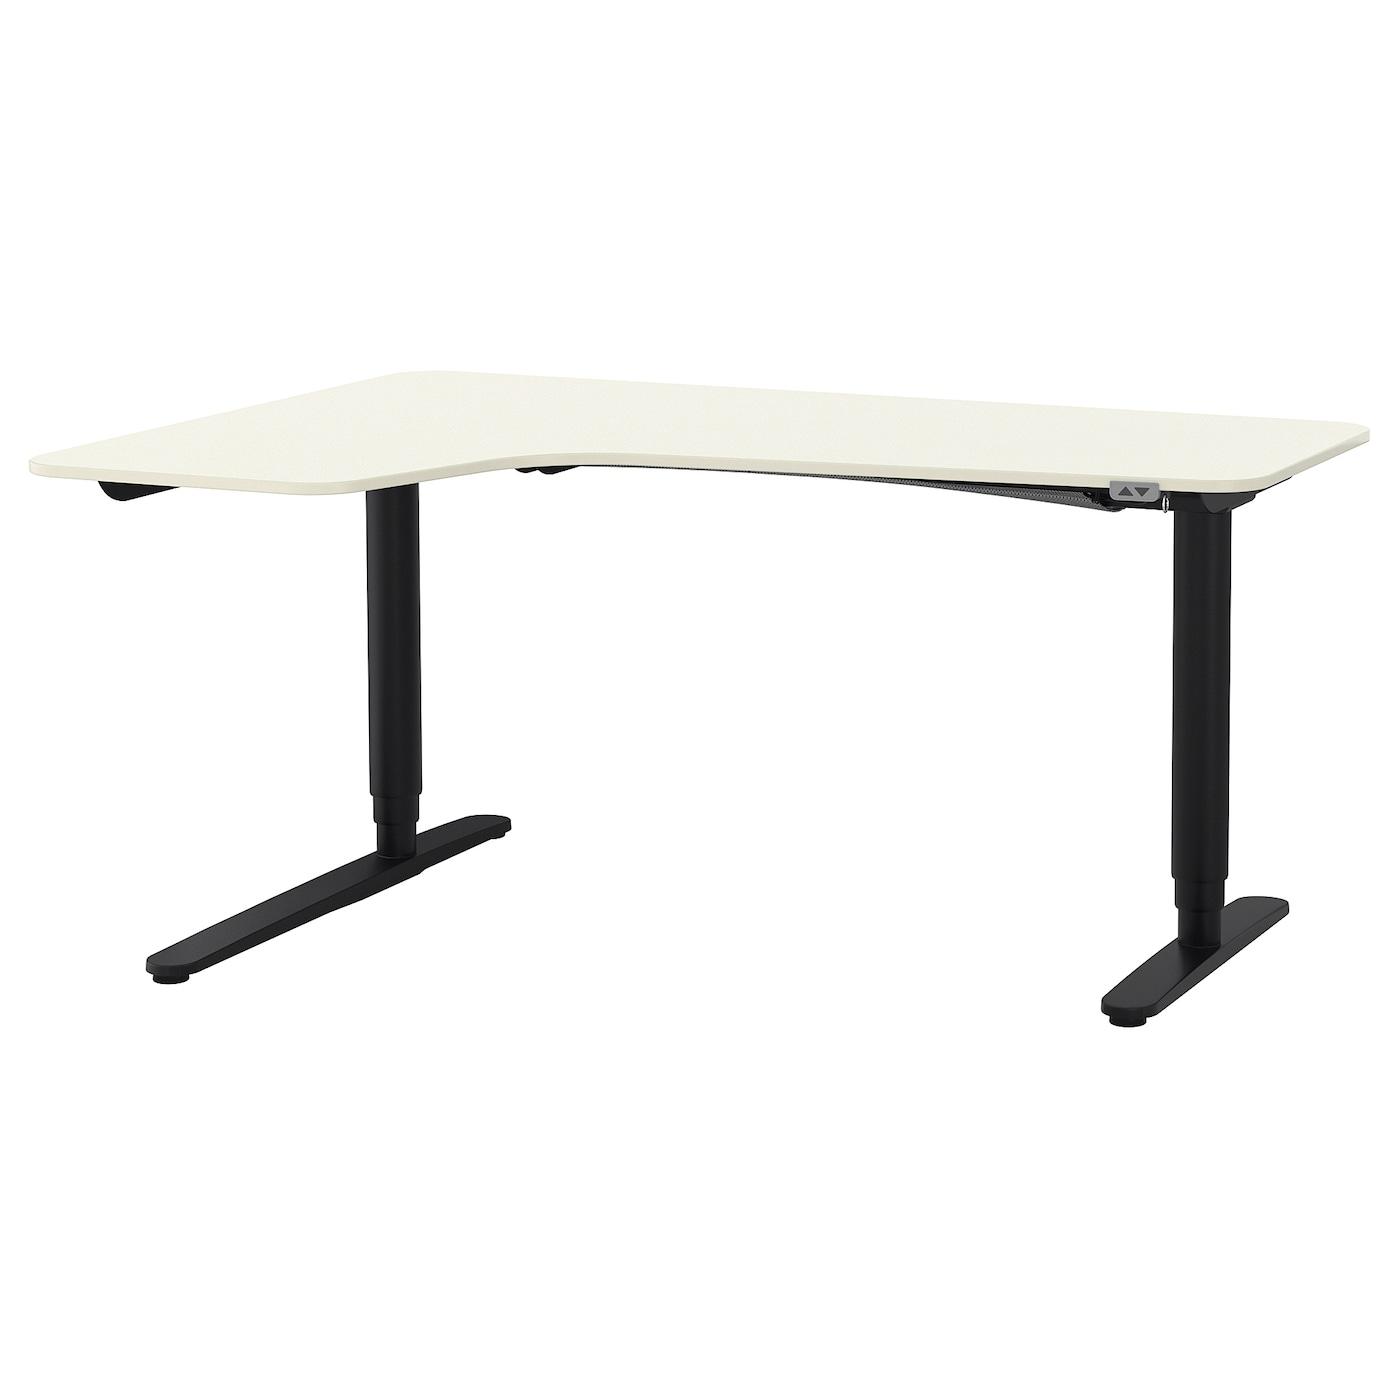 Bekant Corner Desk Left Sit Stand White Black 160 X 110 Cm